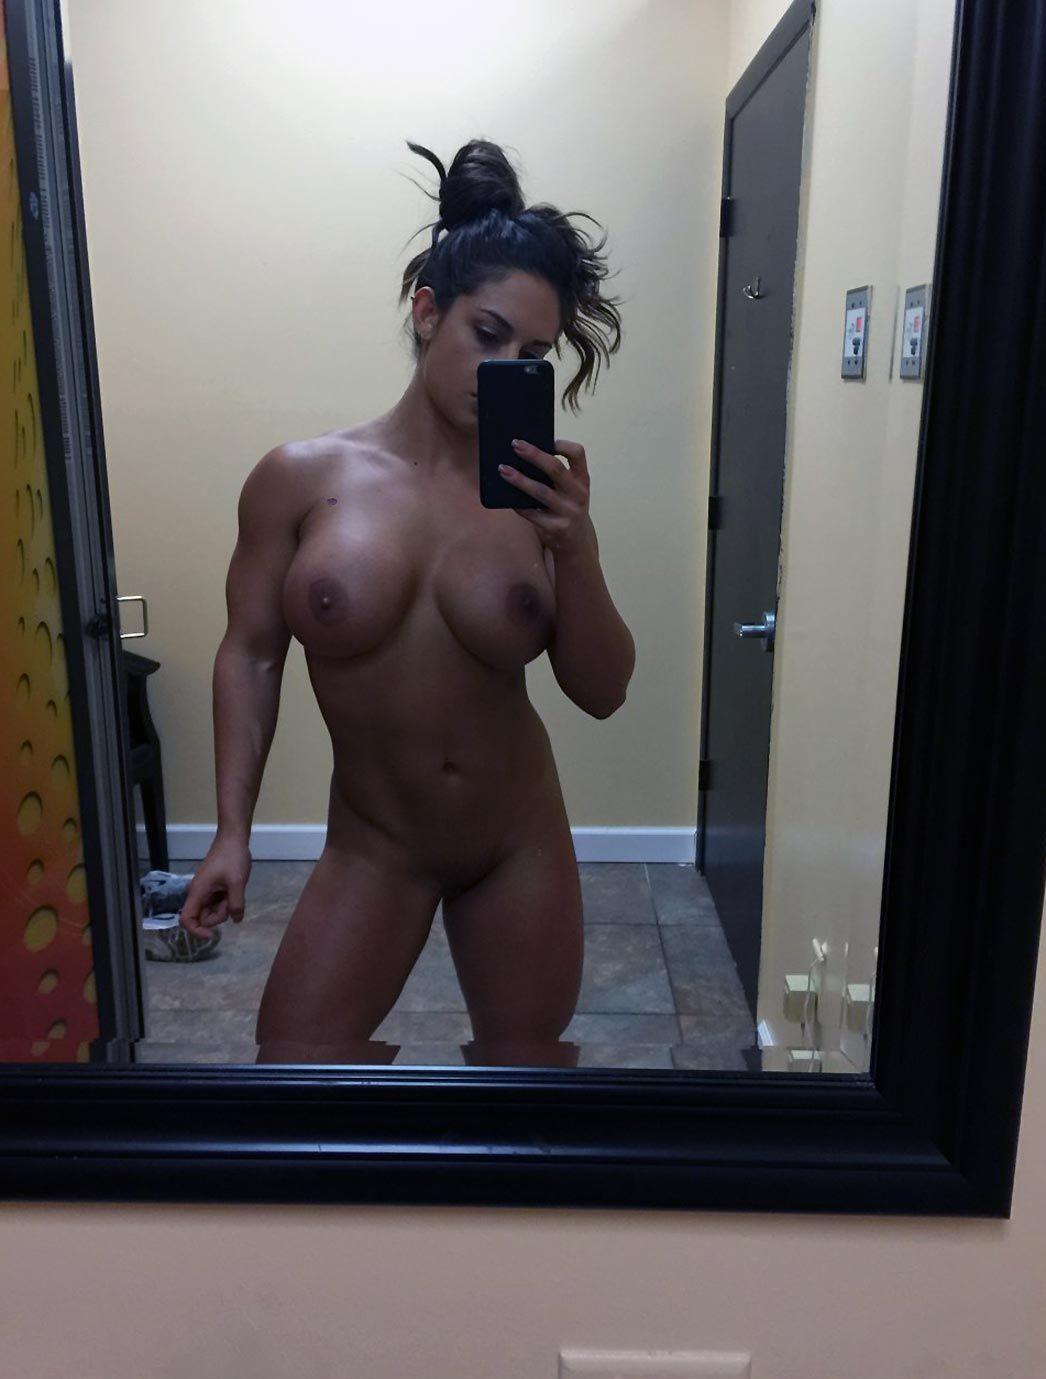 Celeste Bonin Nude Leaked The Fappening & Sexy 0320